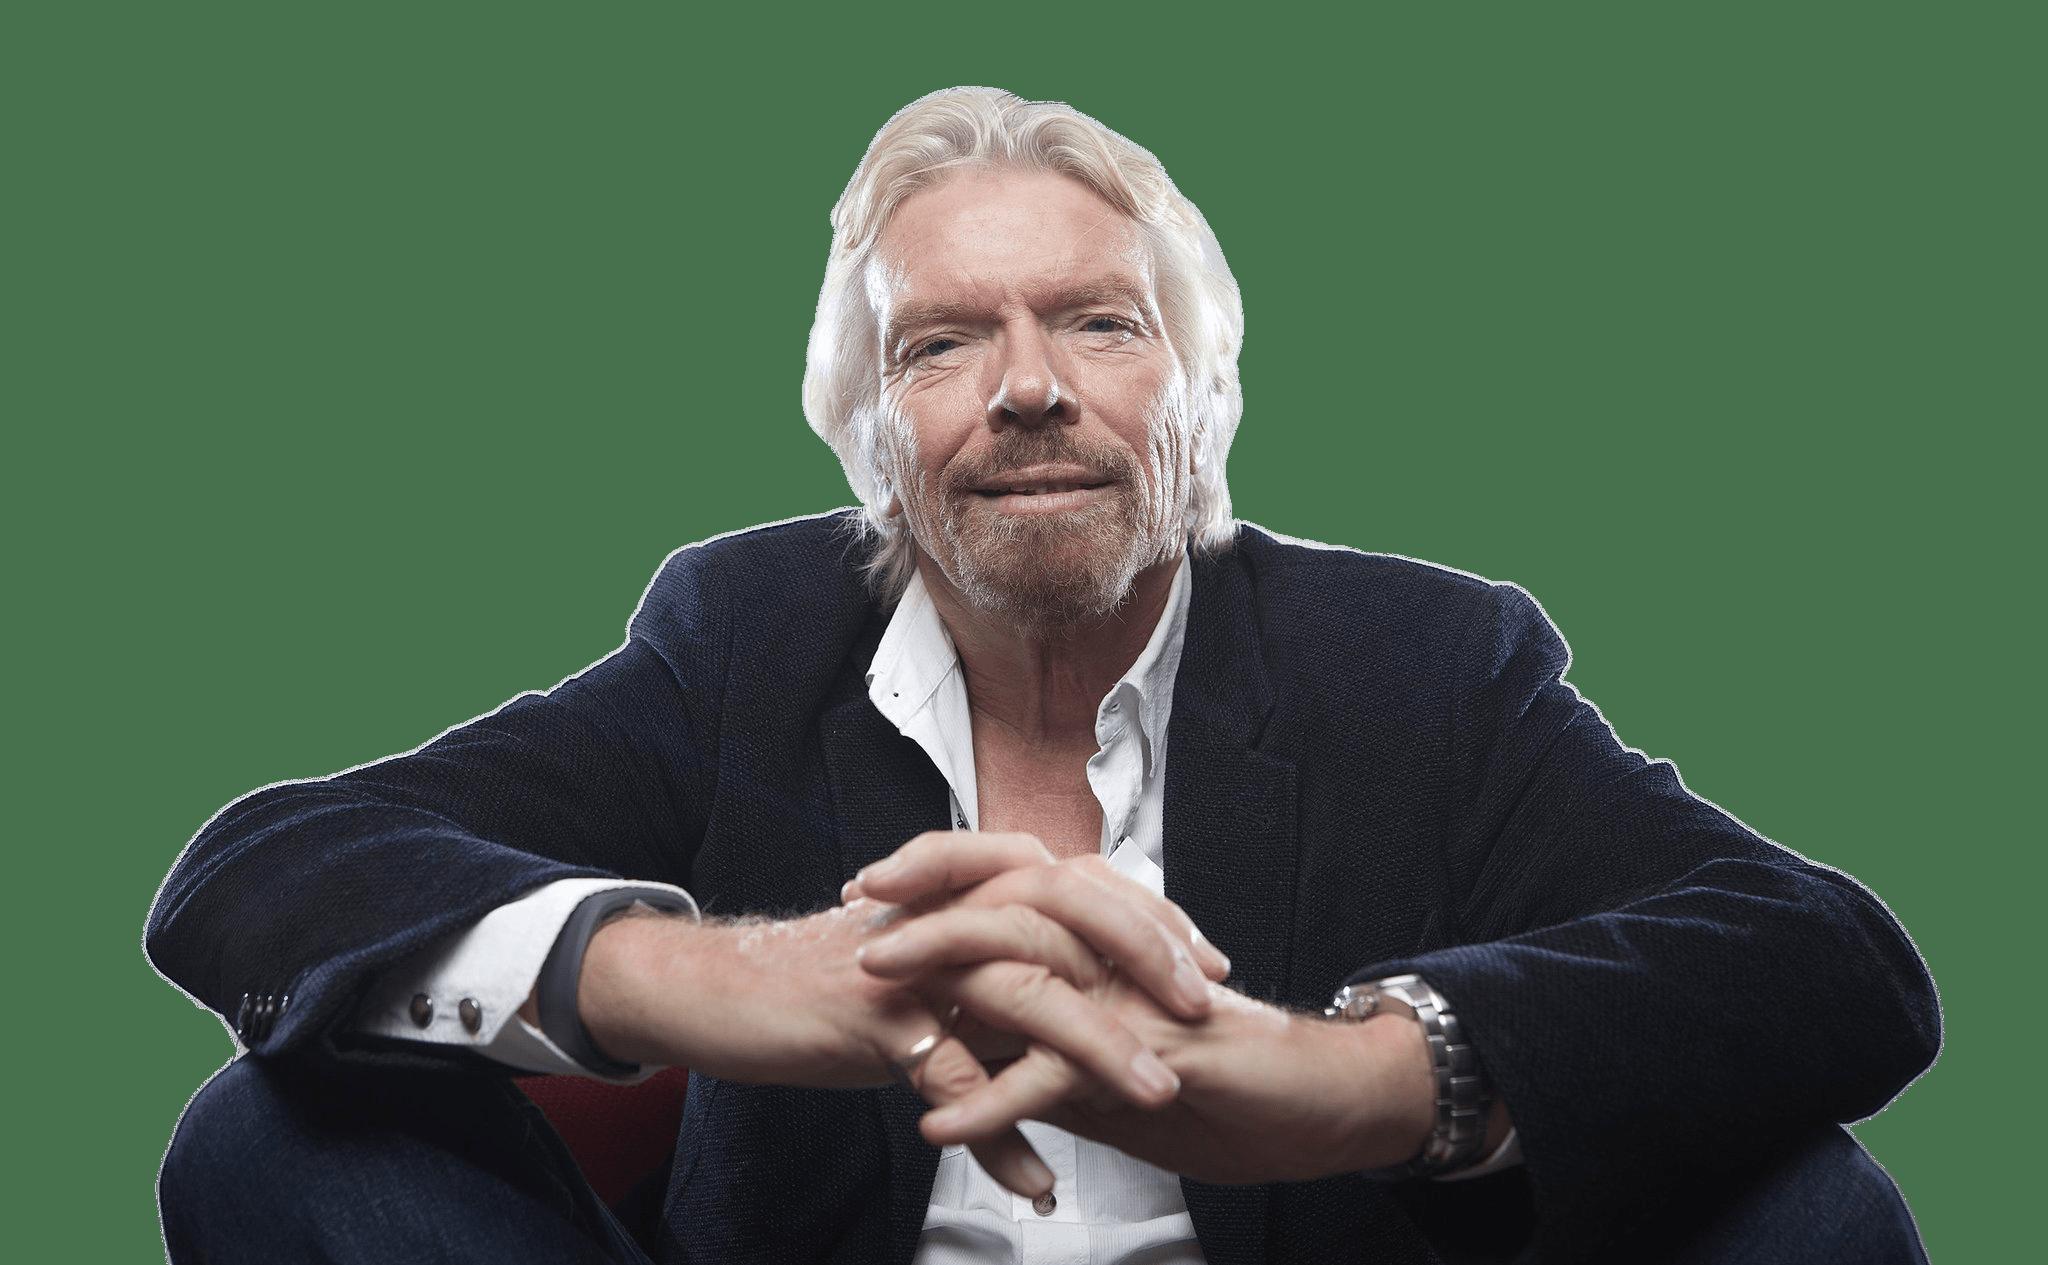 Richard Branson Sitting transparent PNG.